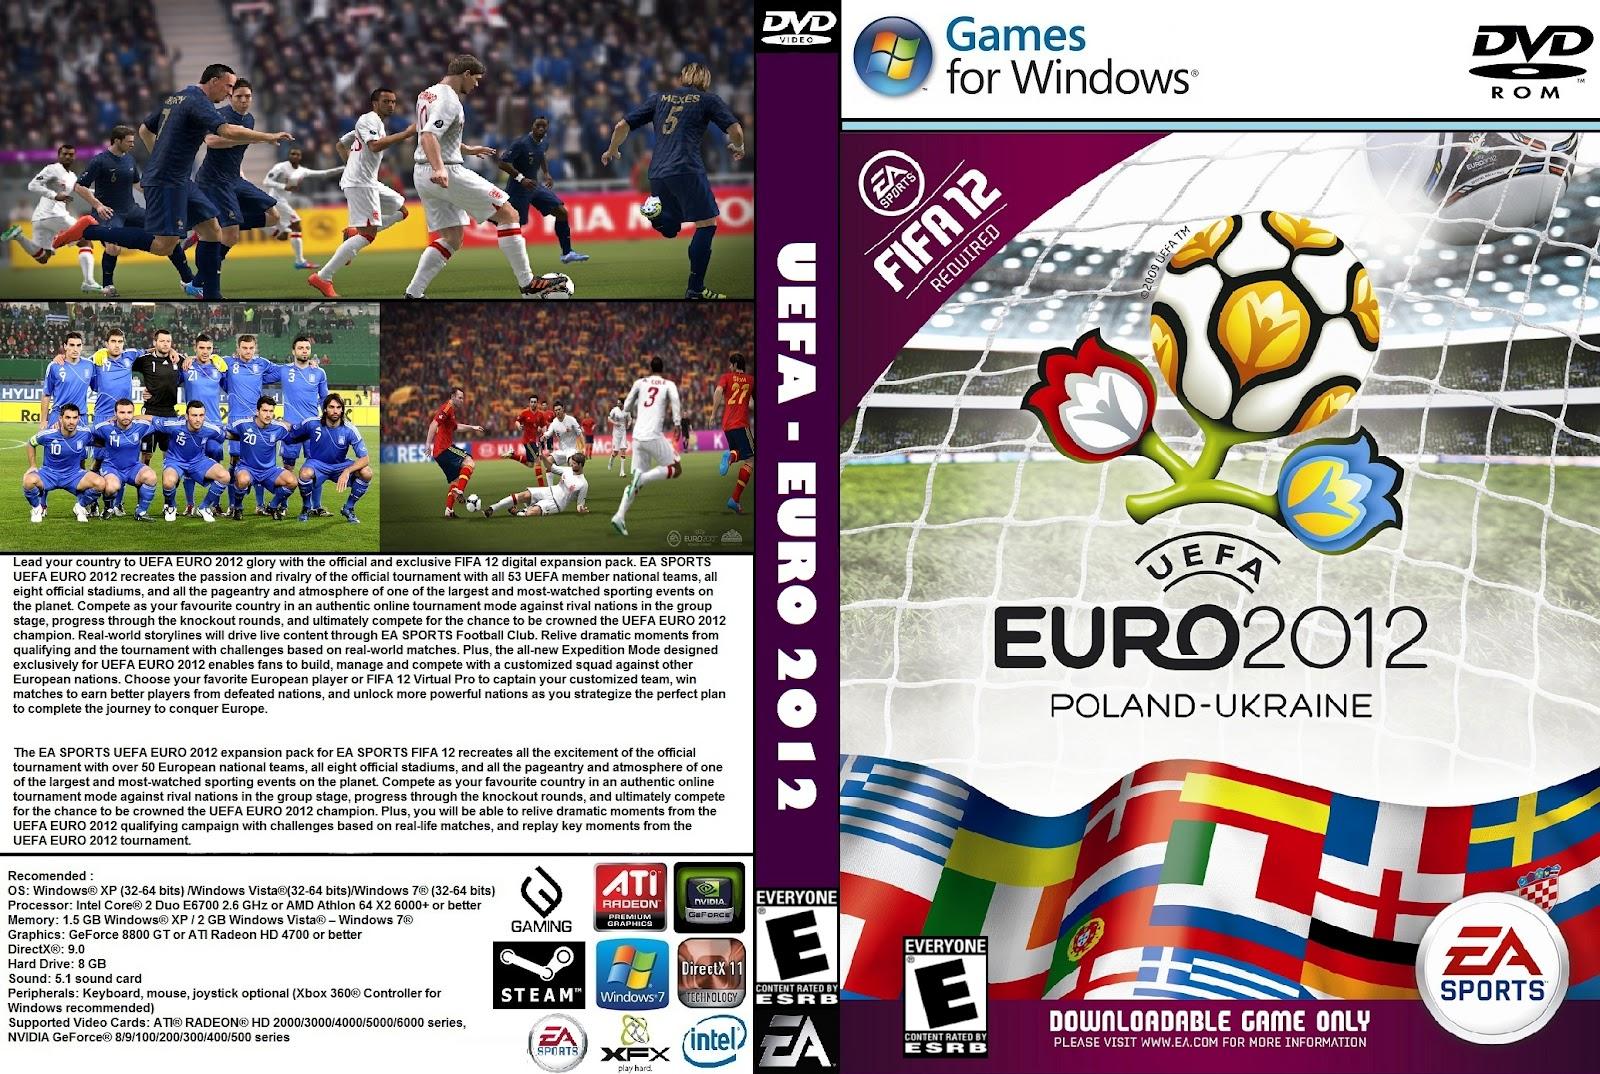 Pes 2012 euro 2012 ko + pl tv logos previews